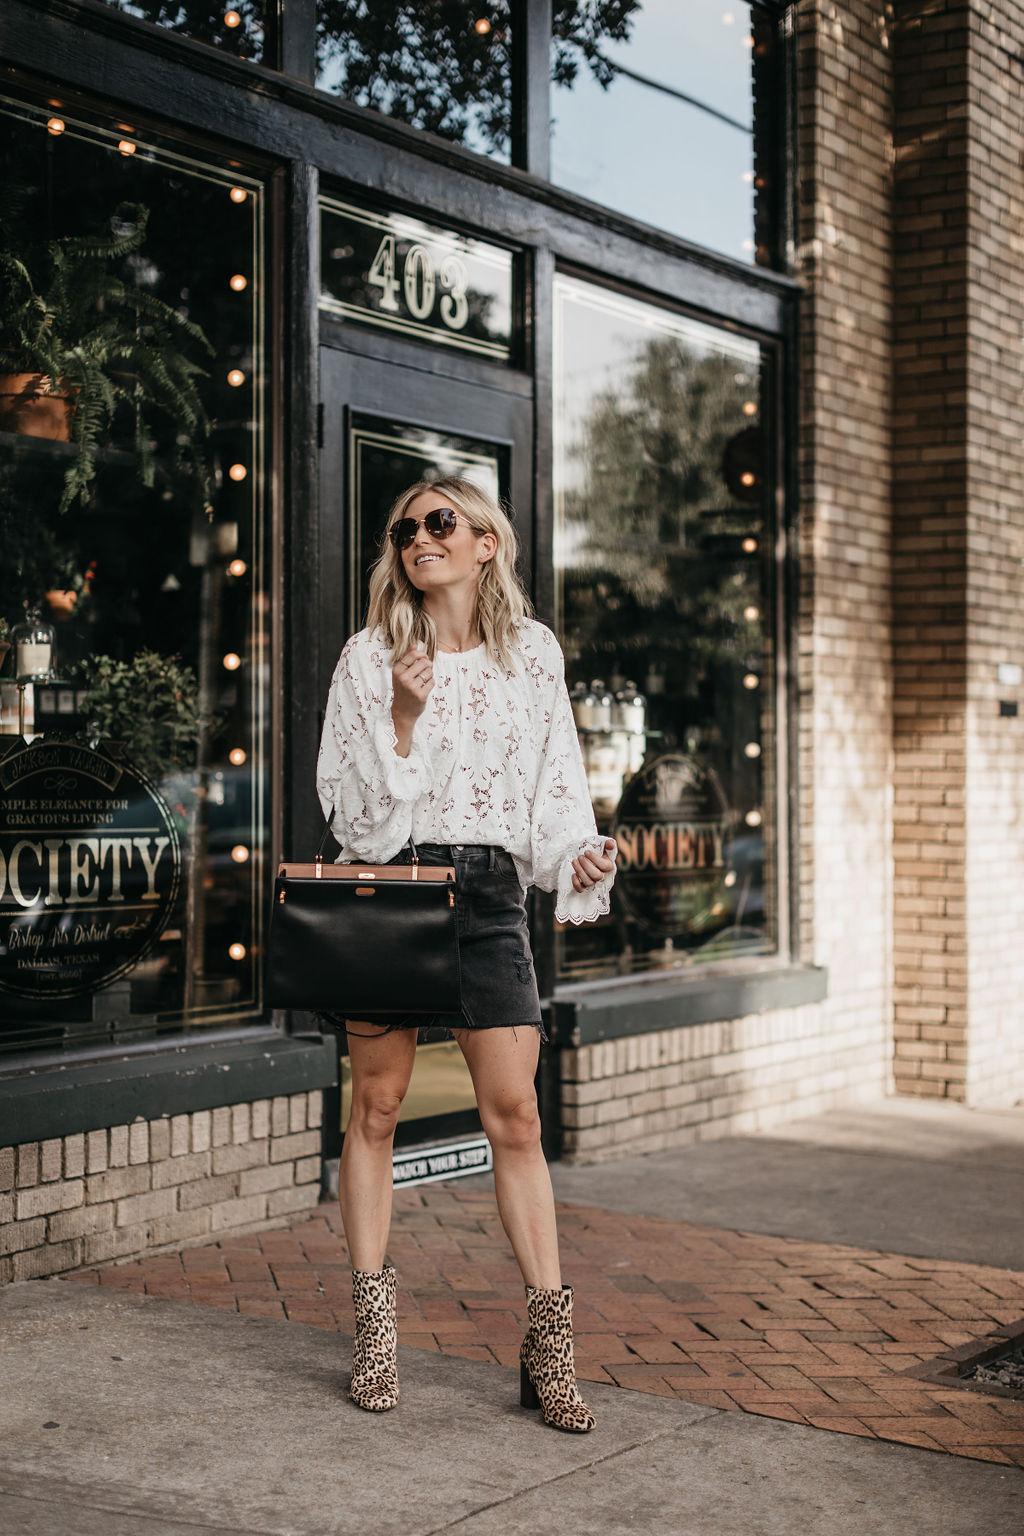 tops shopbop sale fall